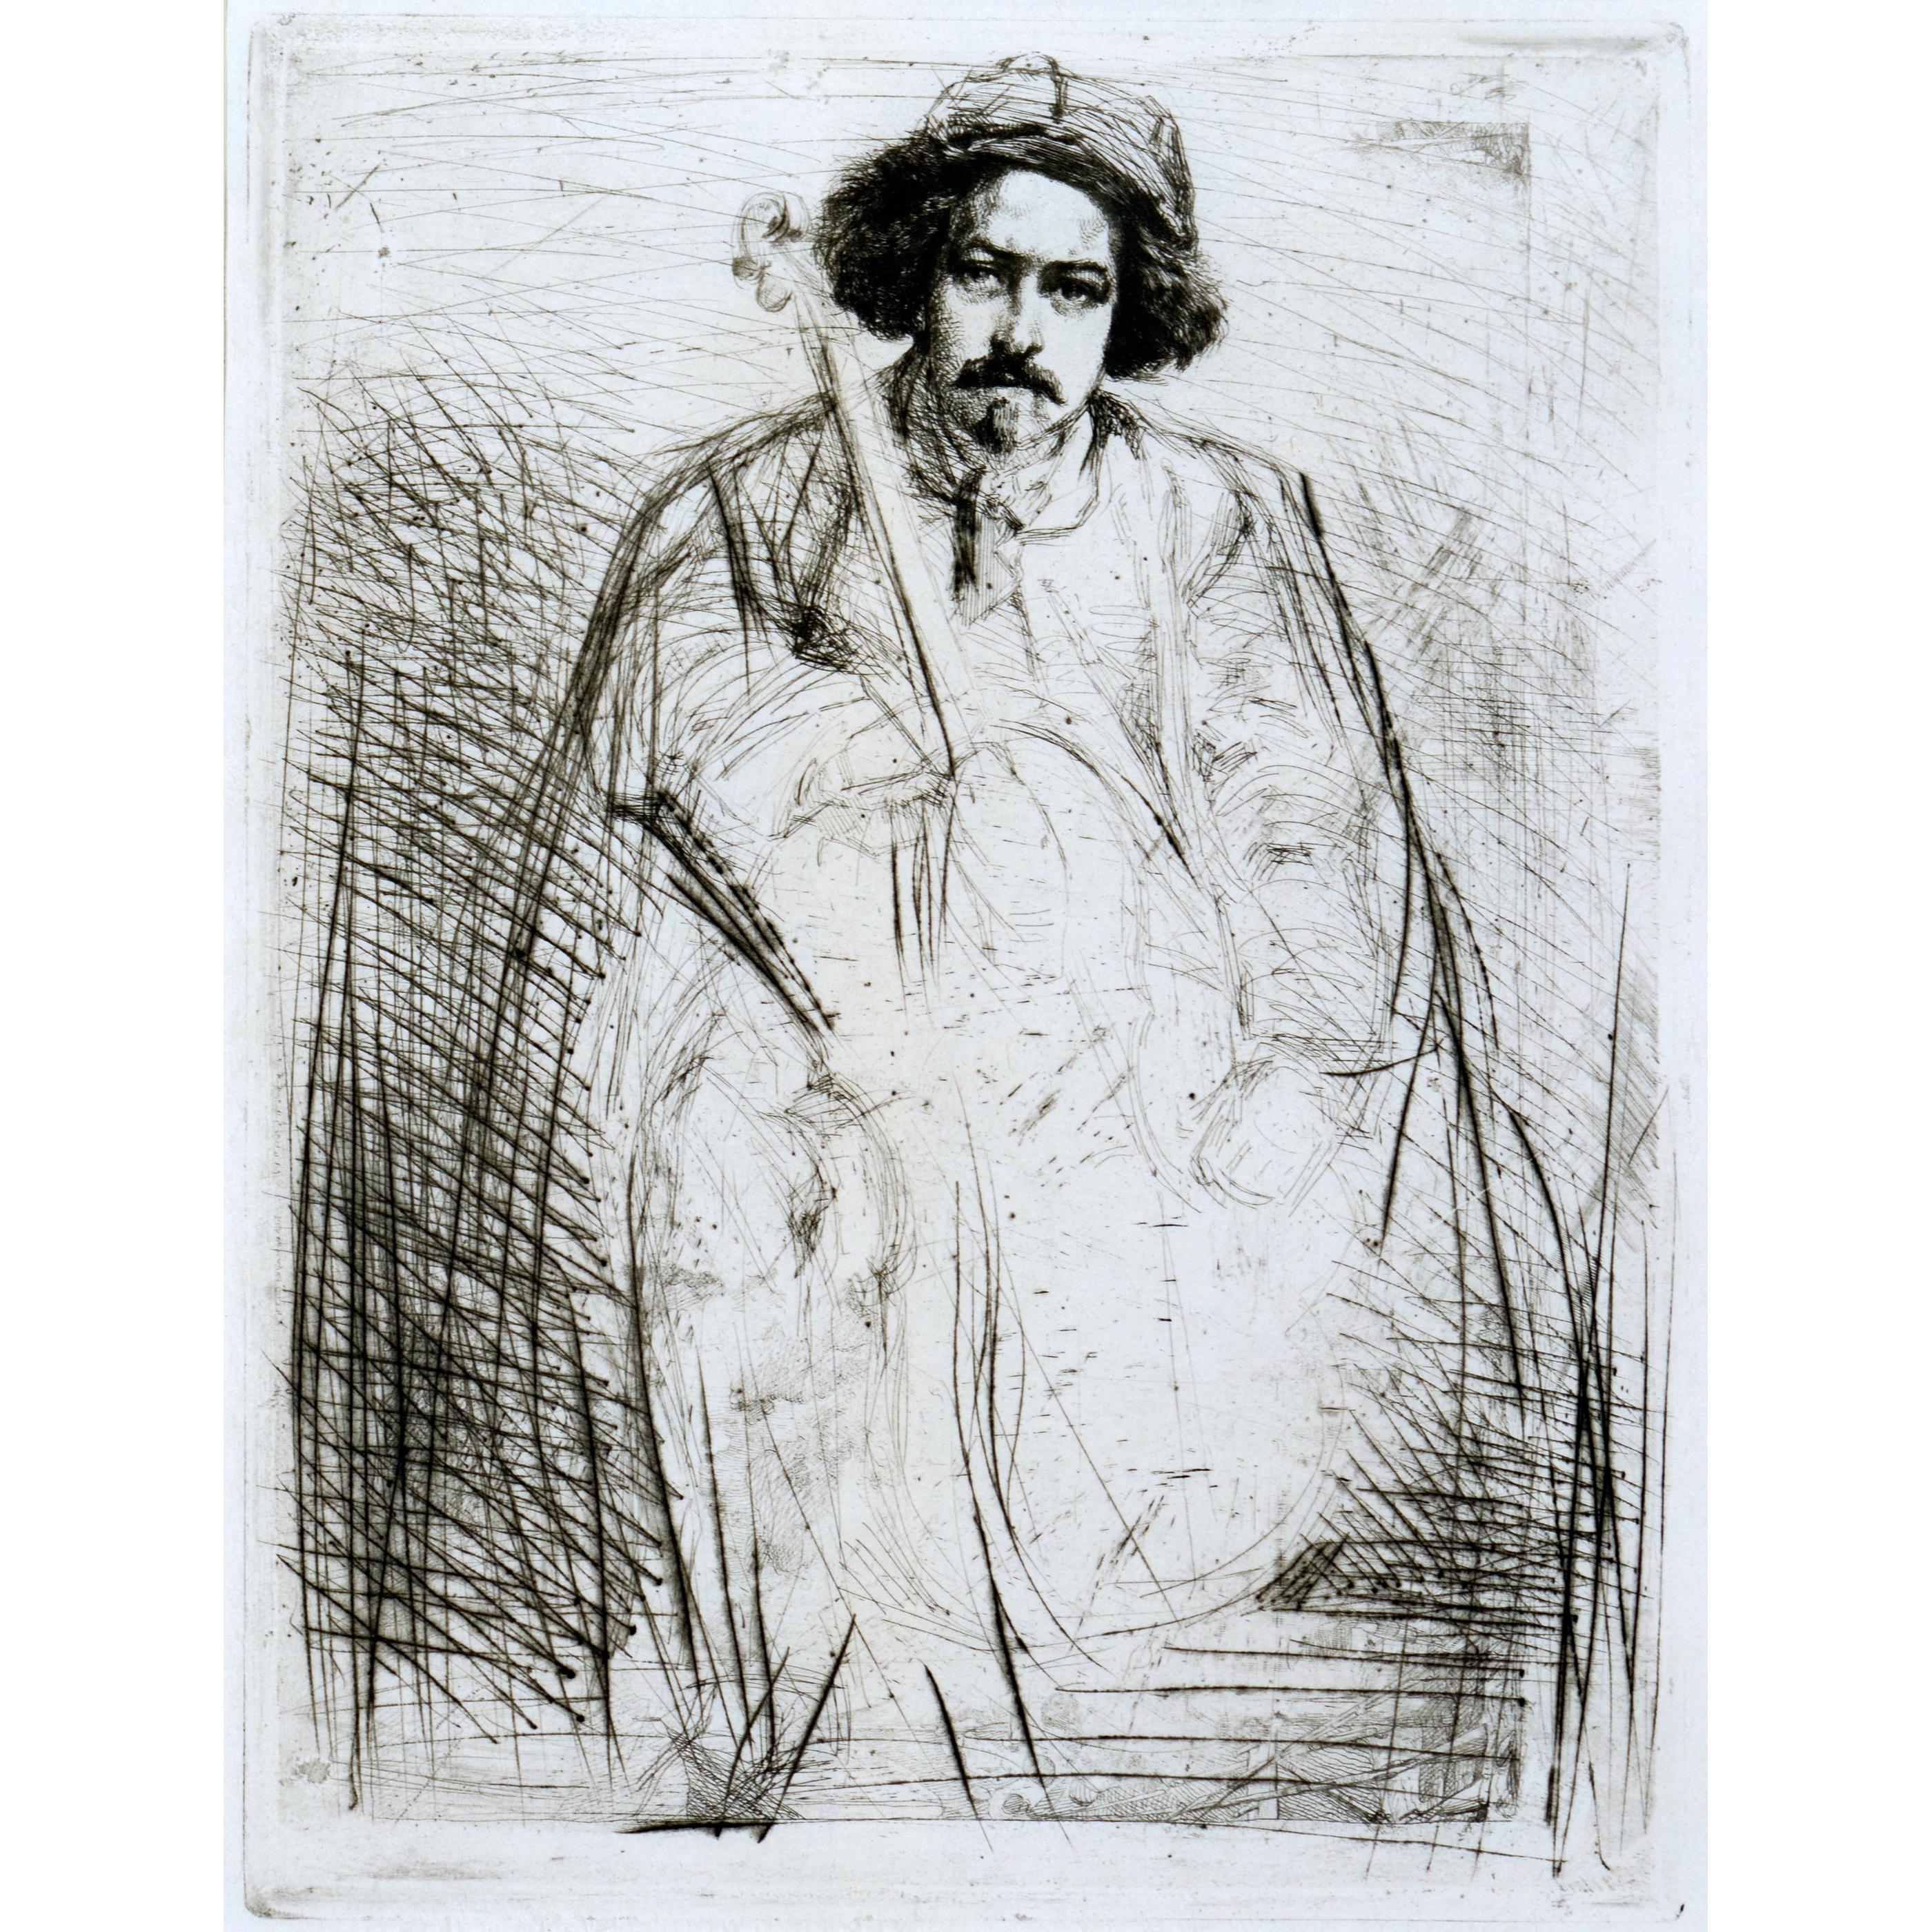 The Fiddler (Becquet), by James Whistler, 1859.